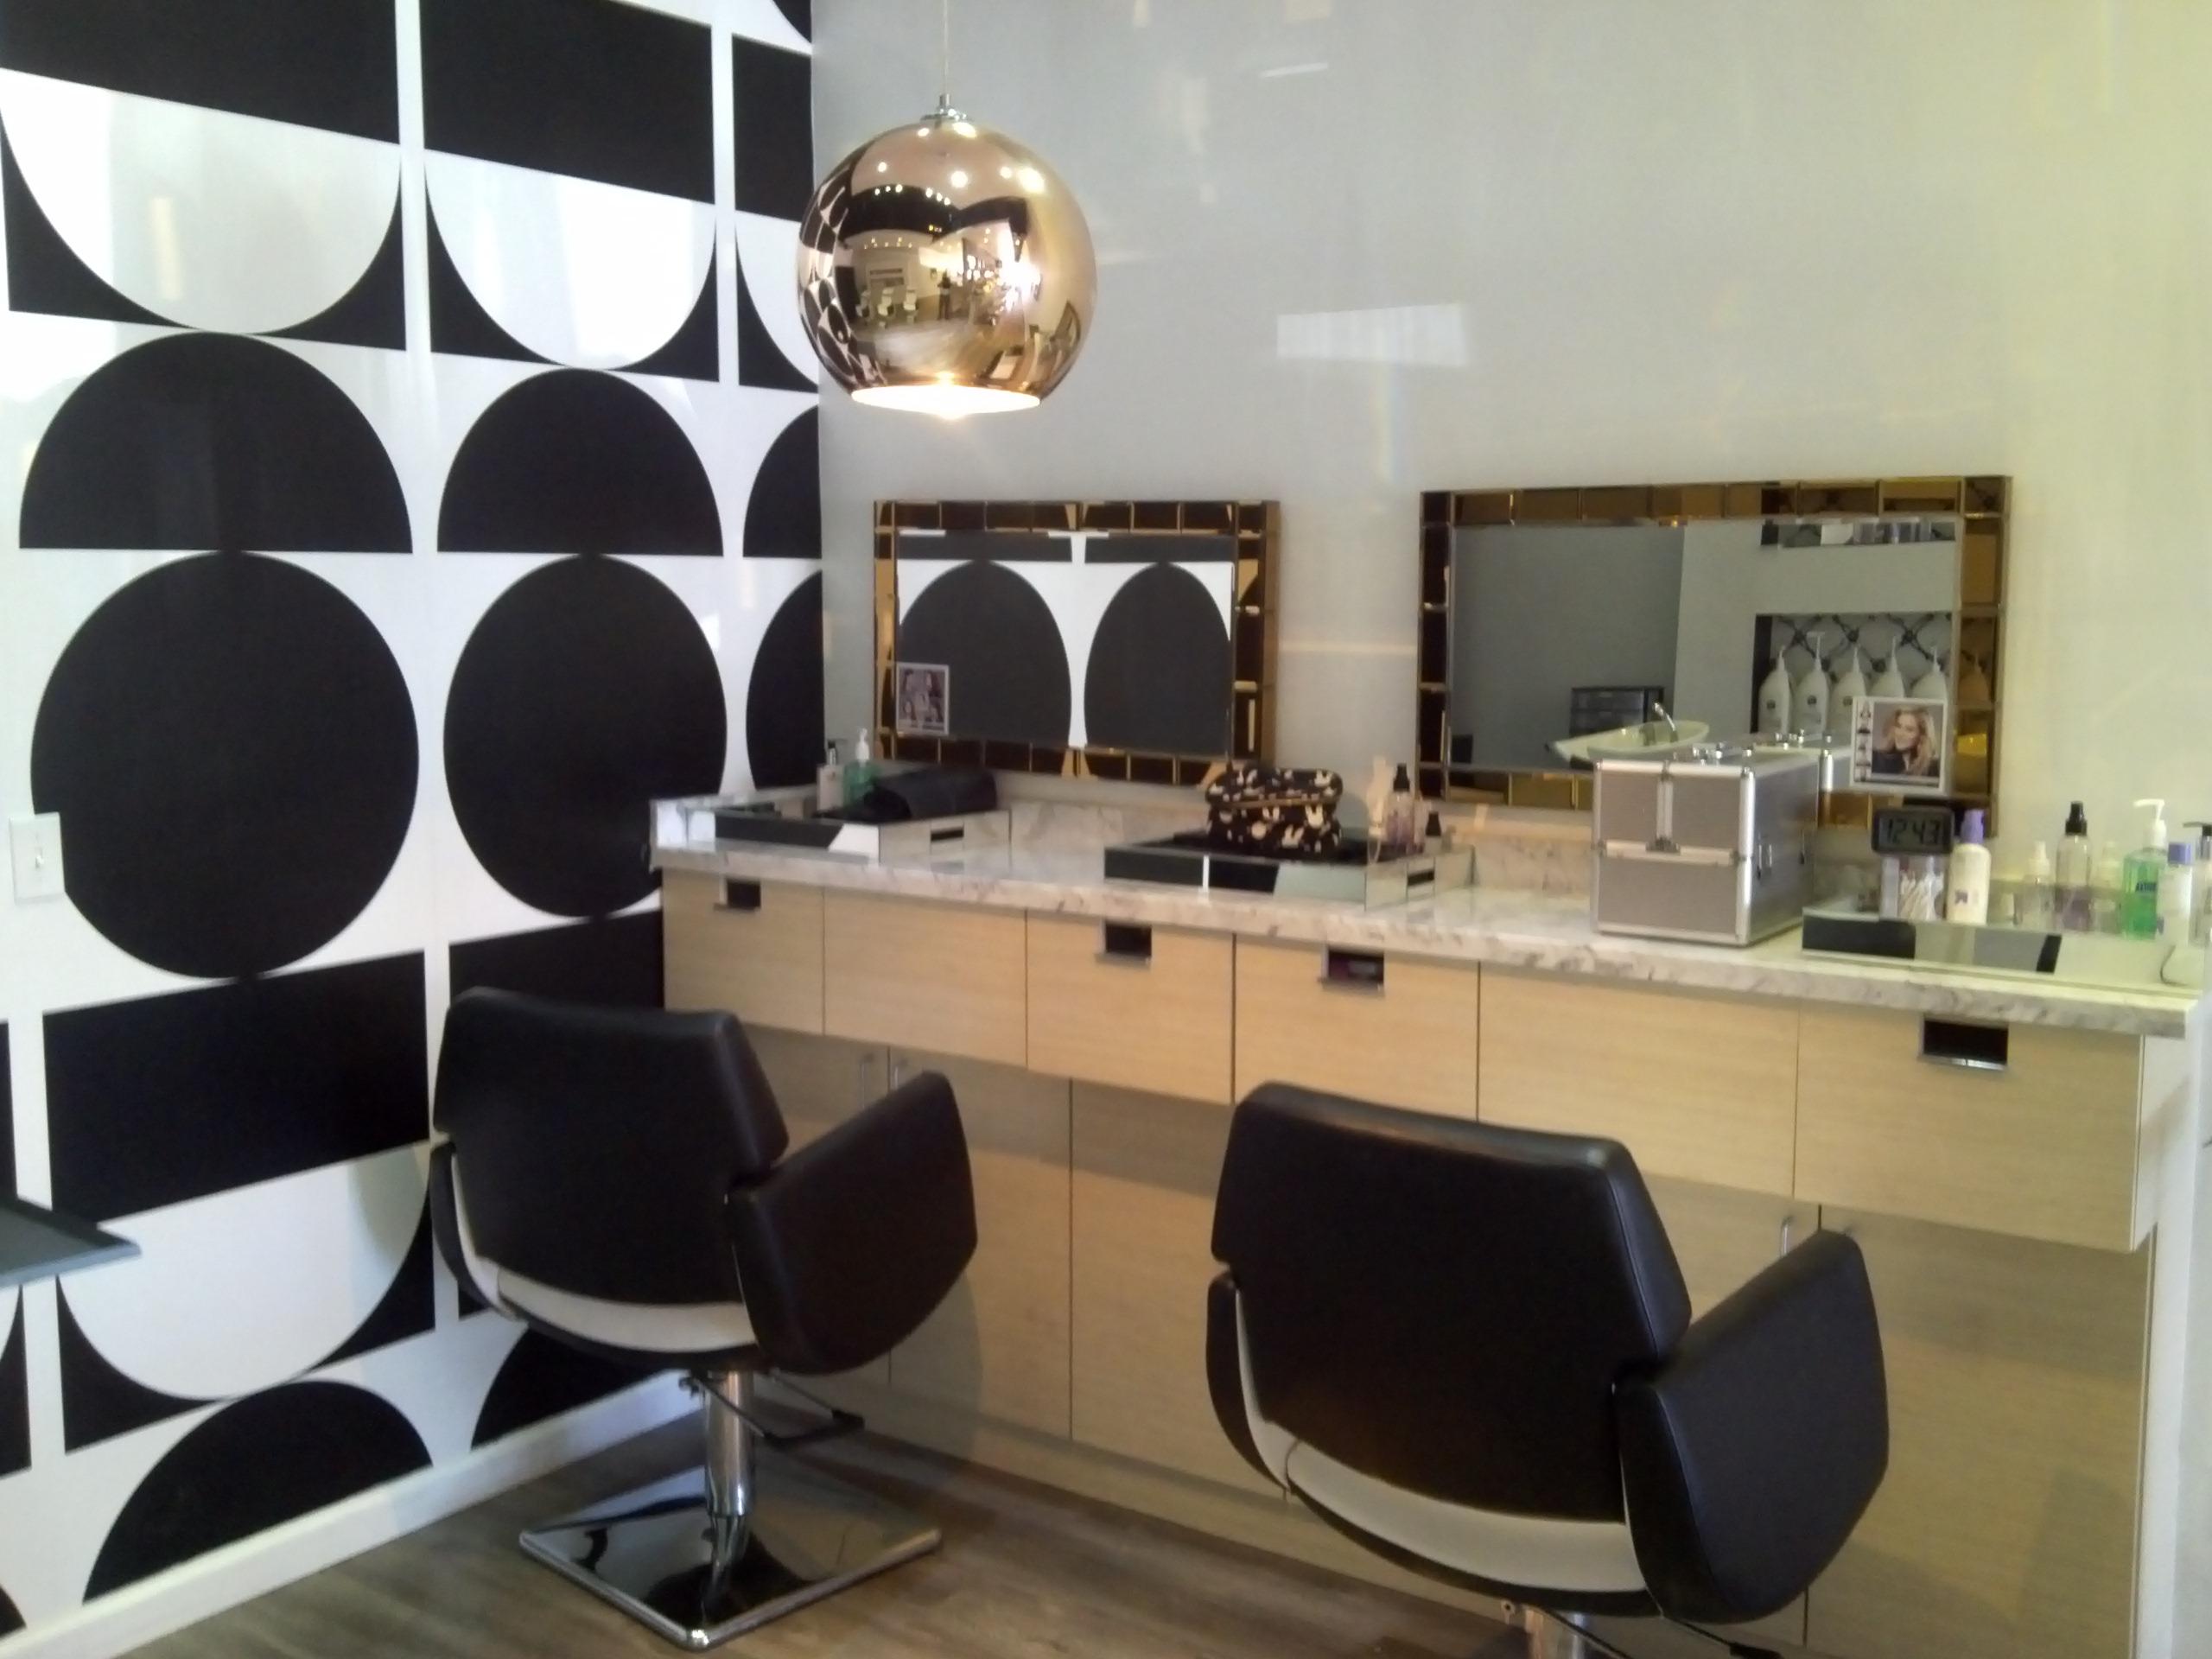 Blowbunny Blow Dry Hair Extension Bar 10445 Craftsman Way 132 San